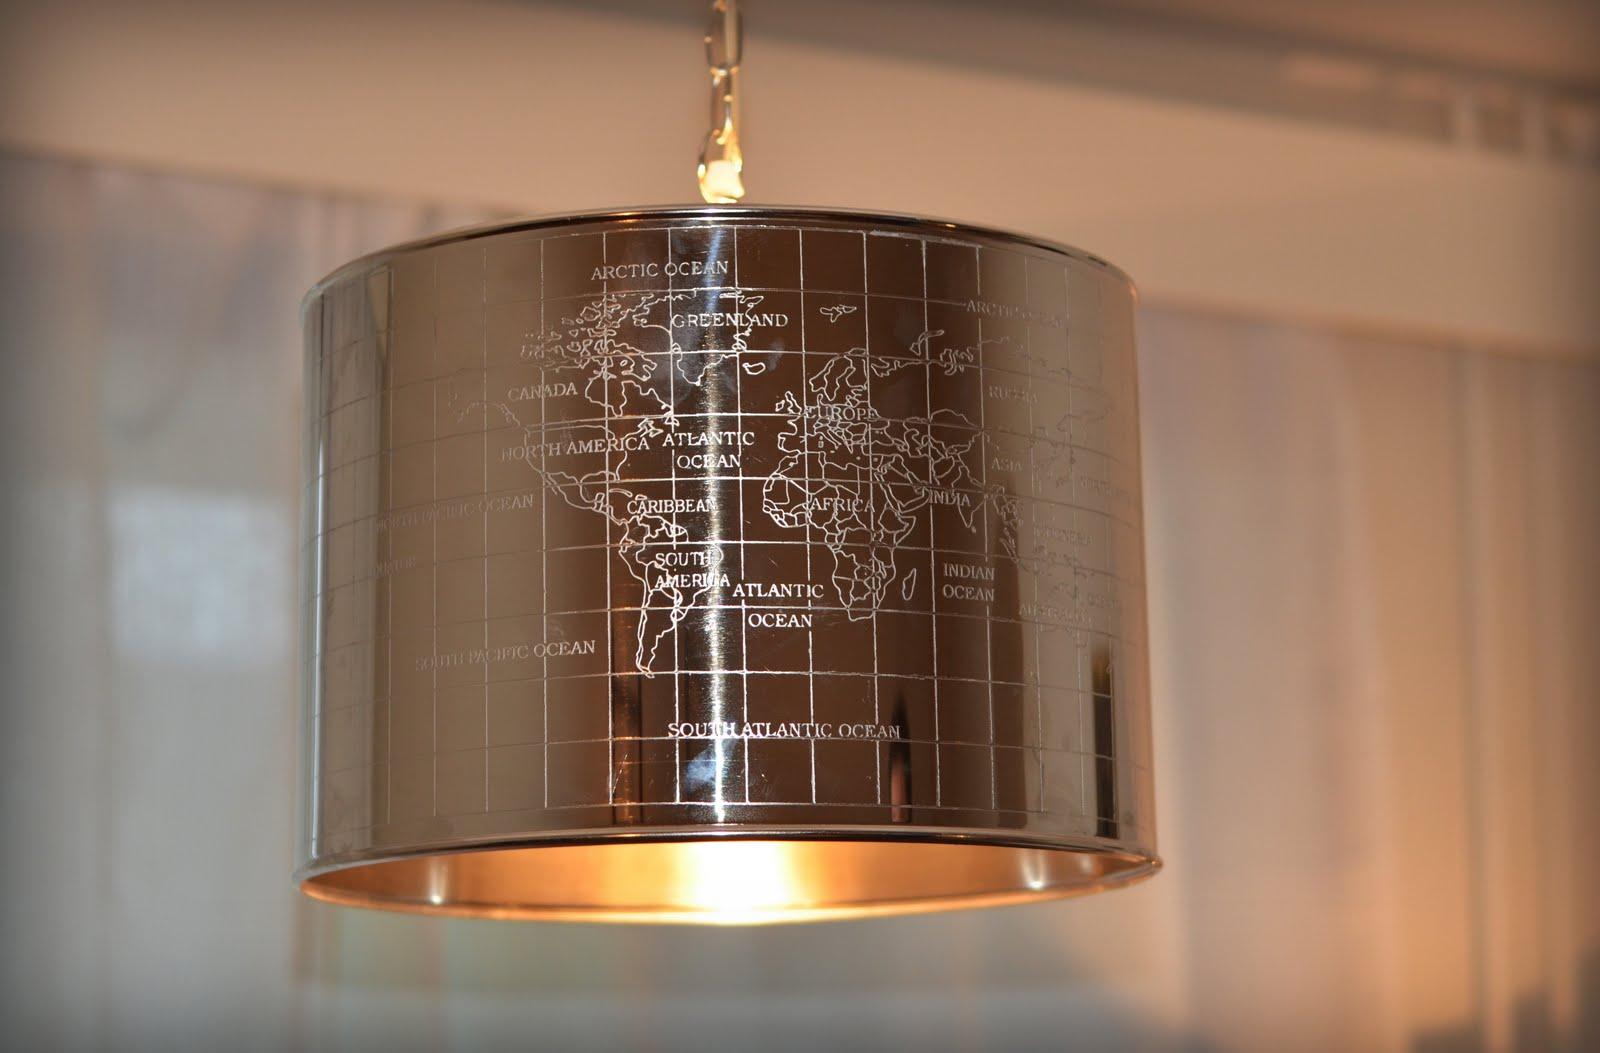 Riviera Maison Lampen : Riviera maison lamps: rm led rustic lamp riviera maison annival